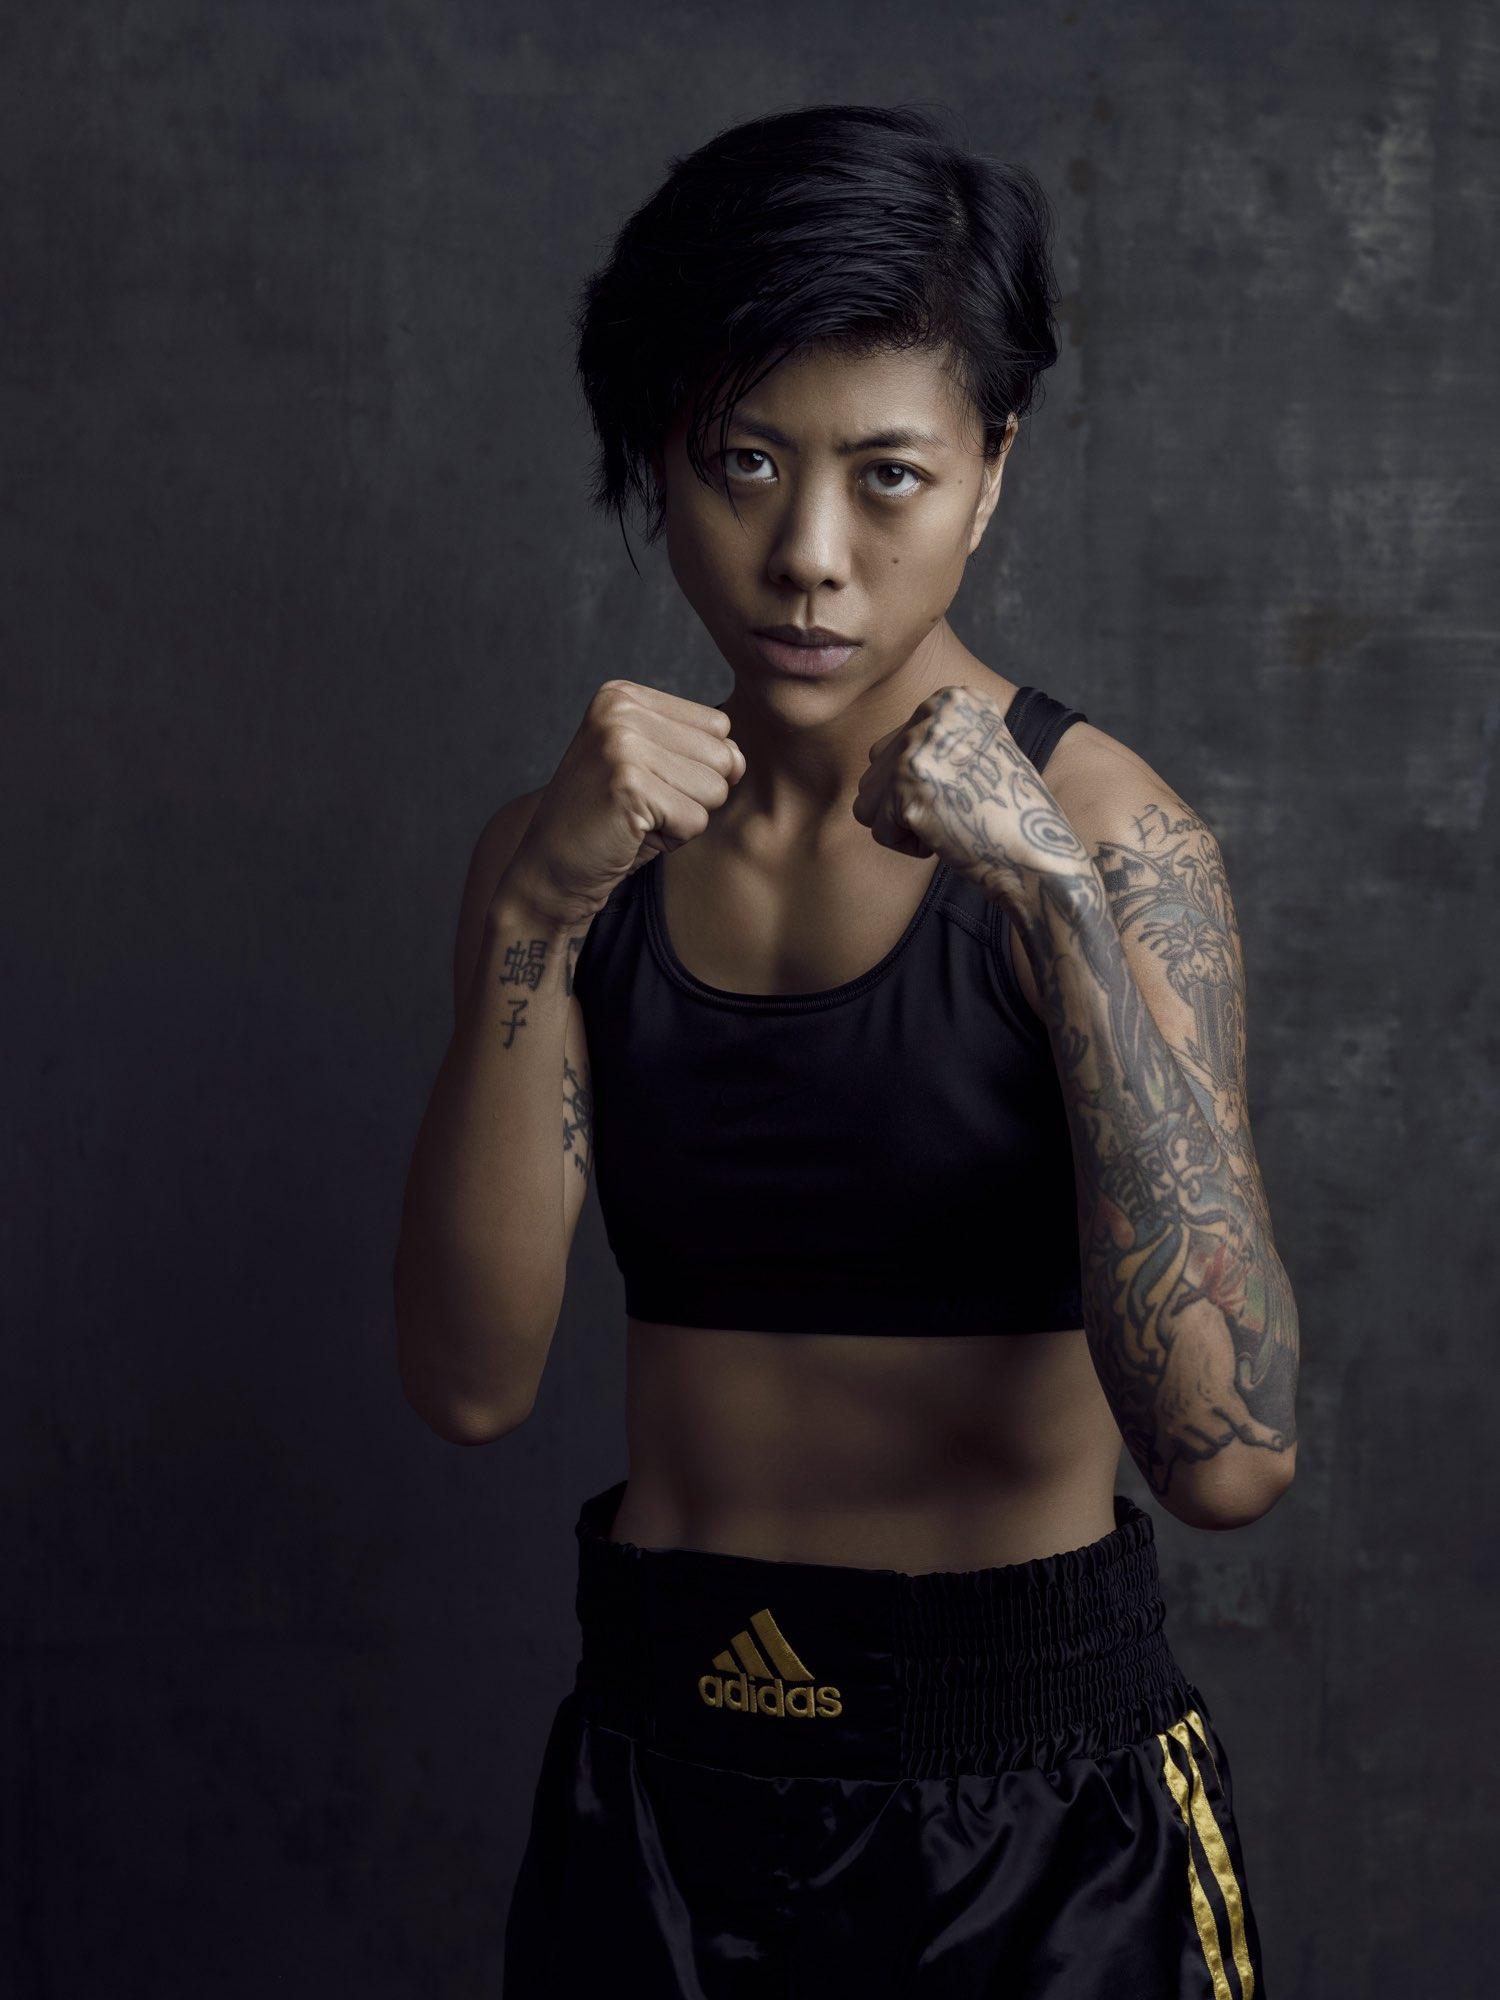 Fashion photography studio singapore services asia photographer photoshoot model woman boxing portrait boxe adidas